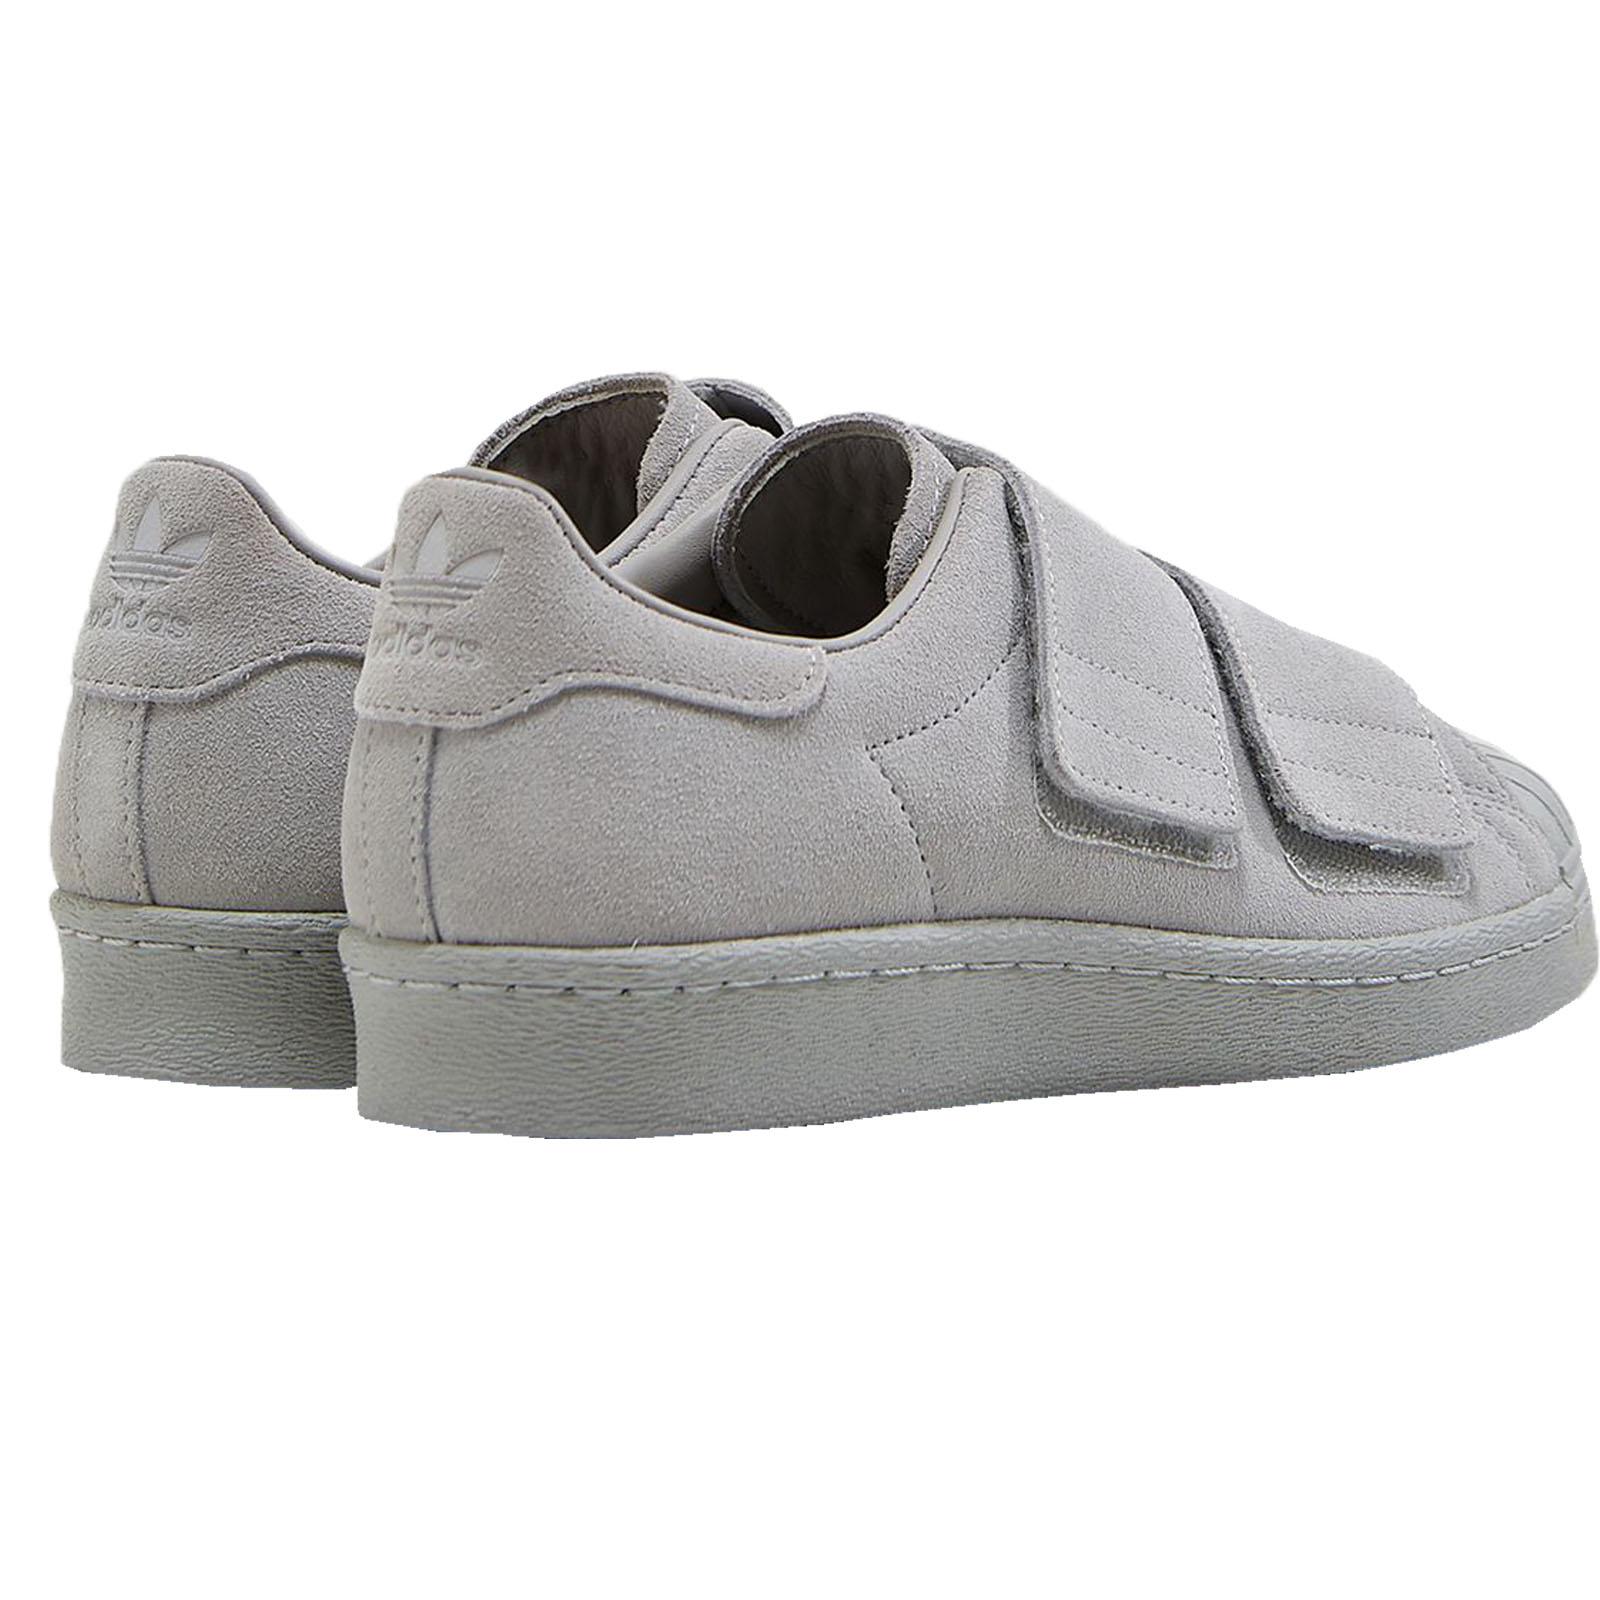 adidas Originals Herren Superstar CF Klettverschluss Sneaker Turnschuhe Grau